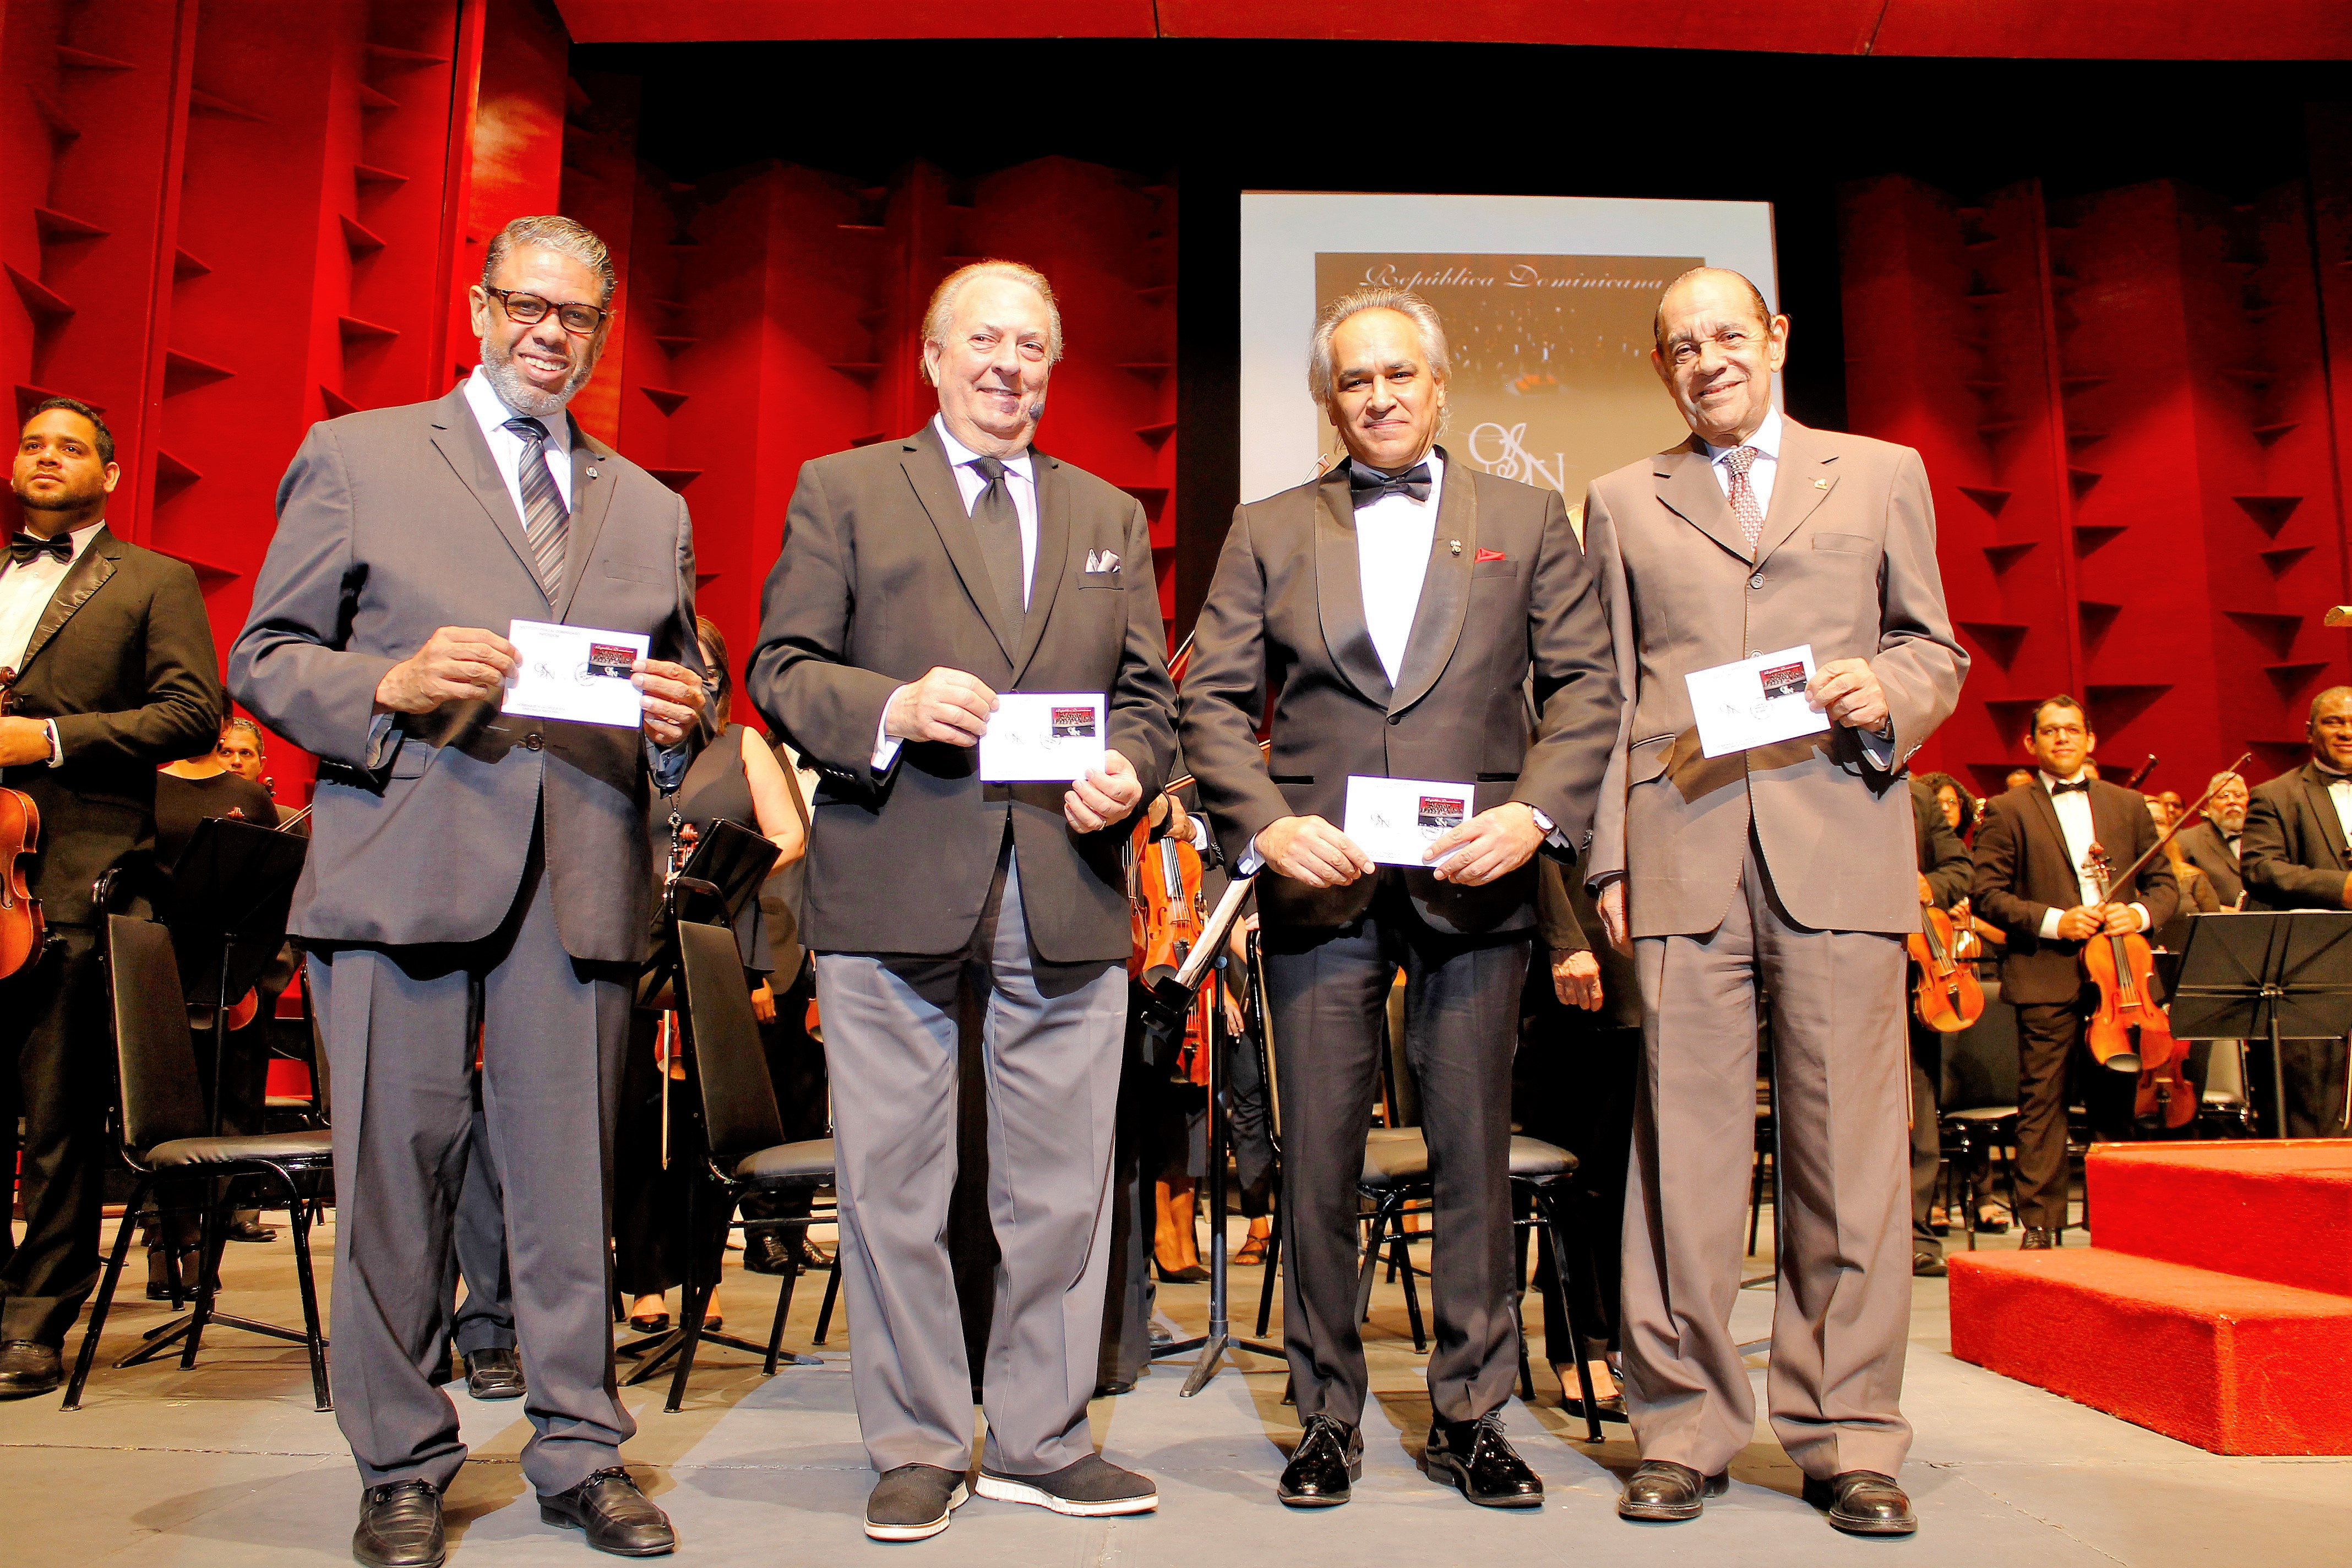 Ponen en circulación sellos en homenaje a Orquesta Sinfónica Nacional